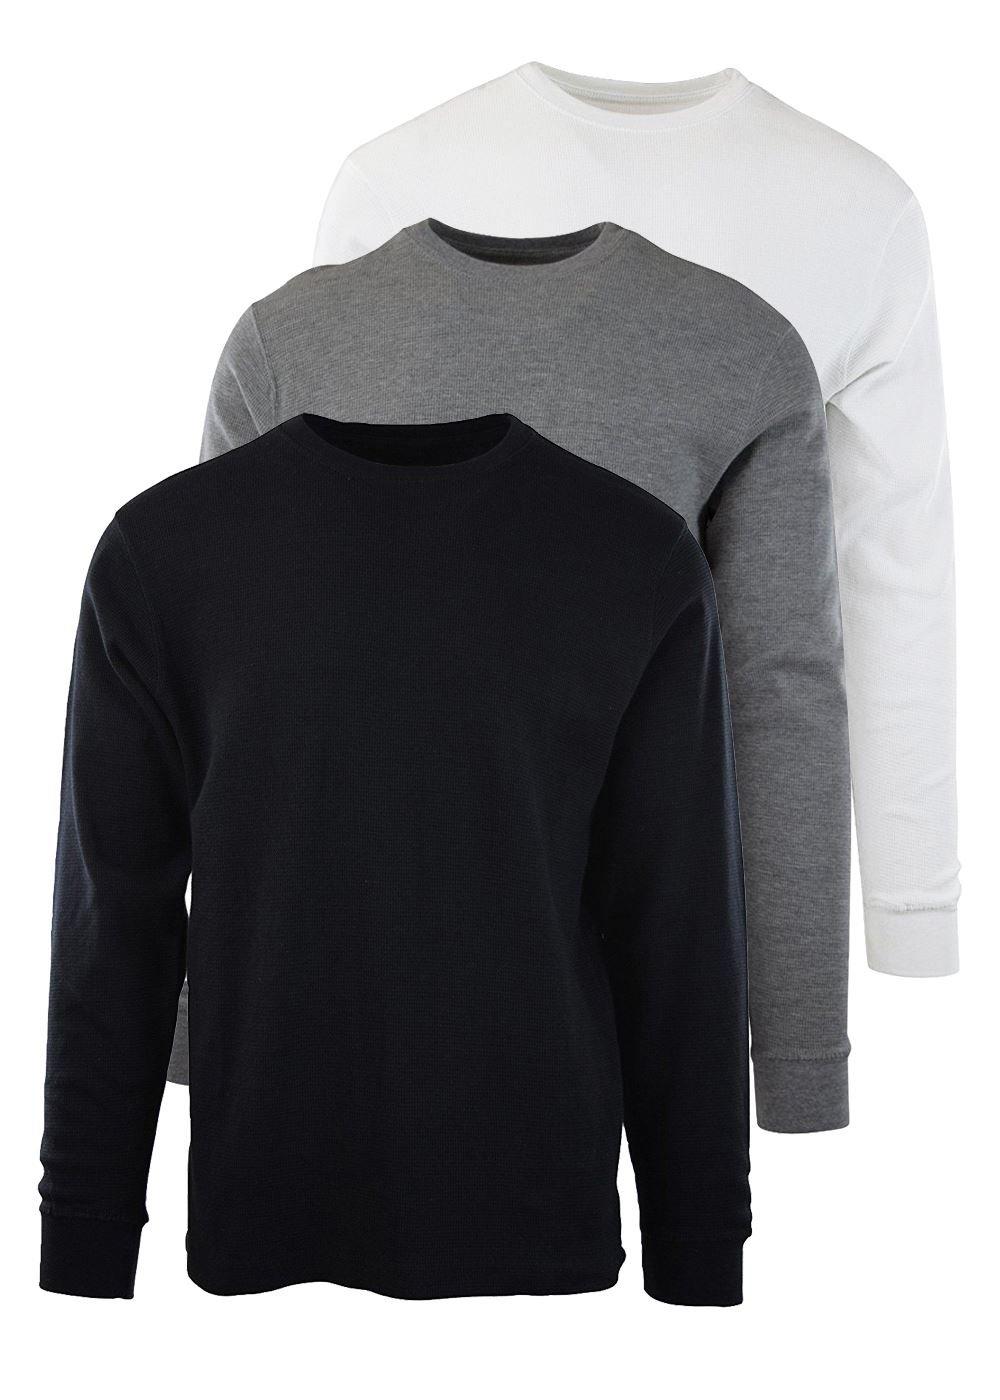 Byn Dynasty Thermal 3-Pack Long Sleeve Shirt Black White Grey Medium